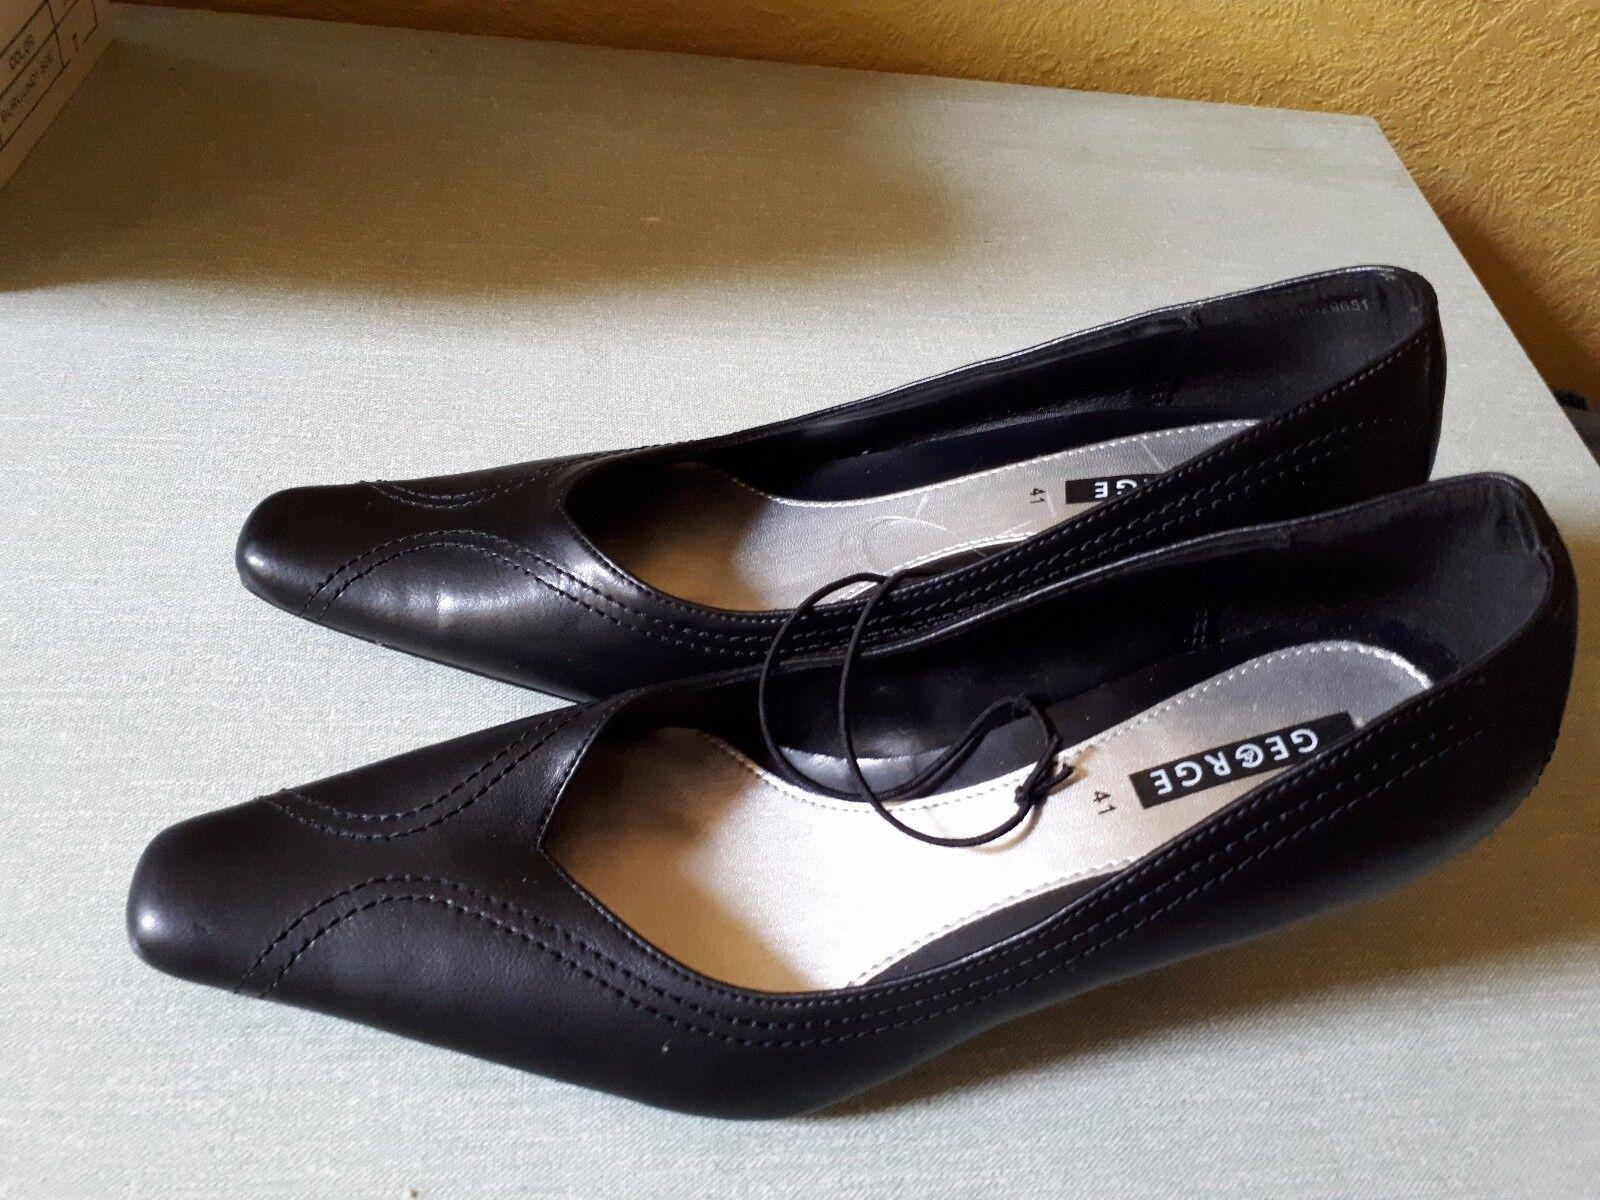 "Ladies George Shoes Black leather Size 7 (41) 2 1/2"" heel - never worn"